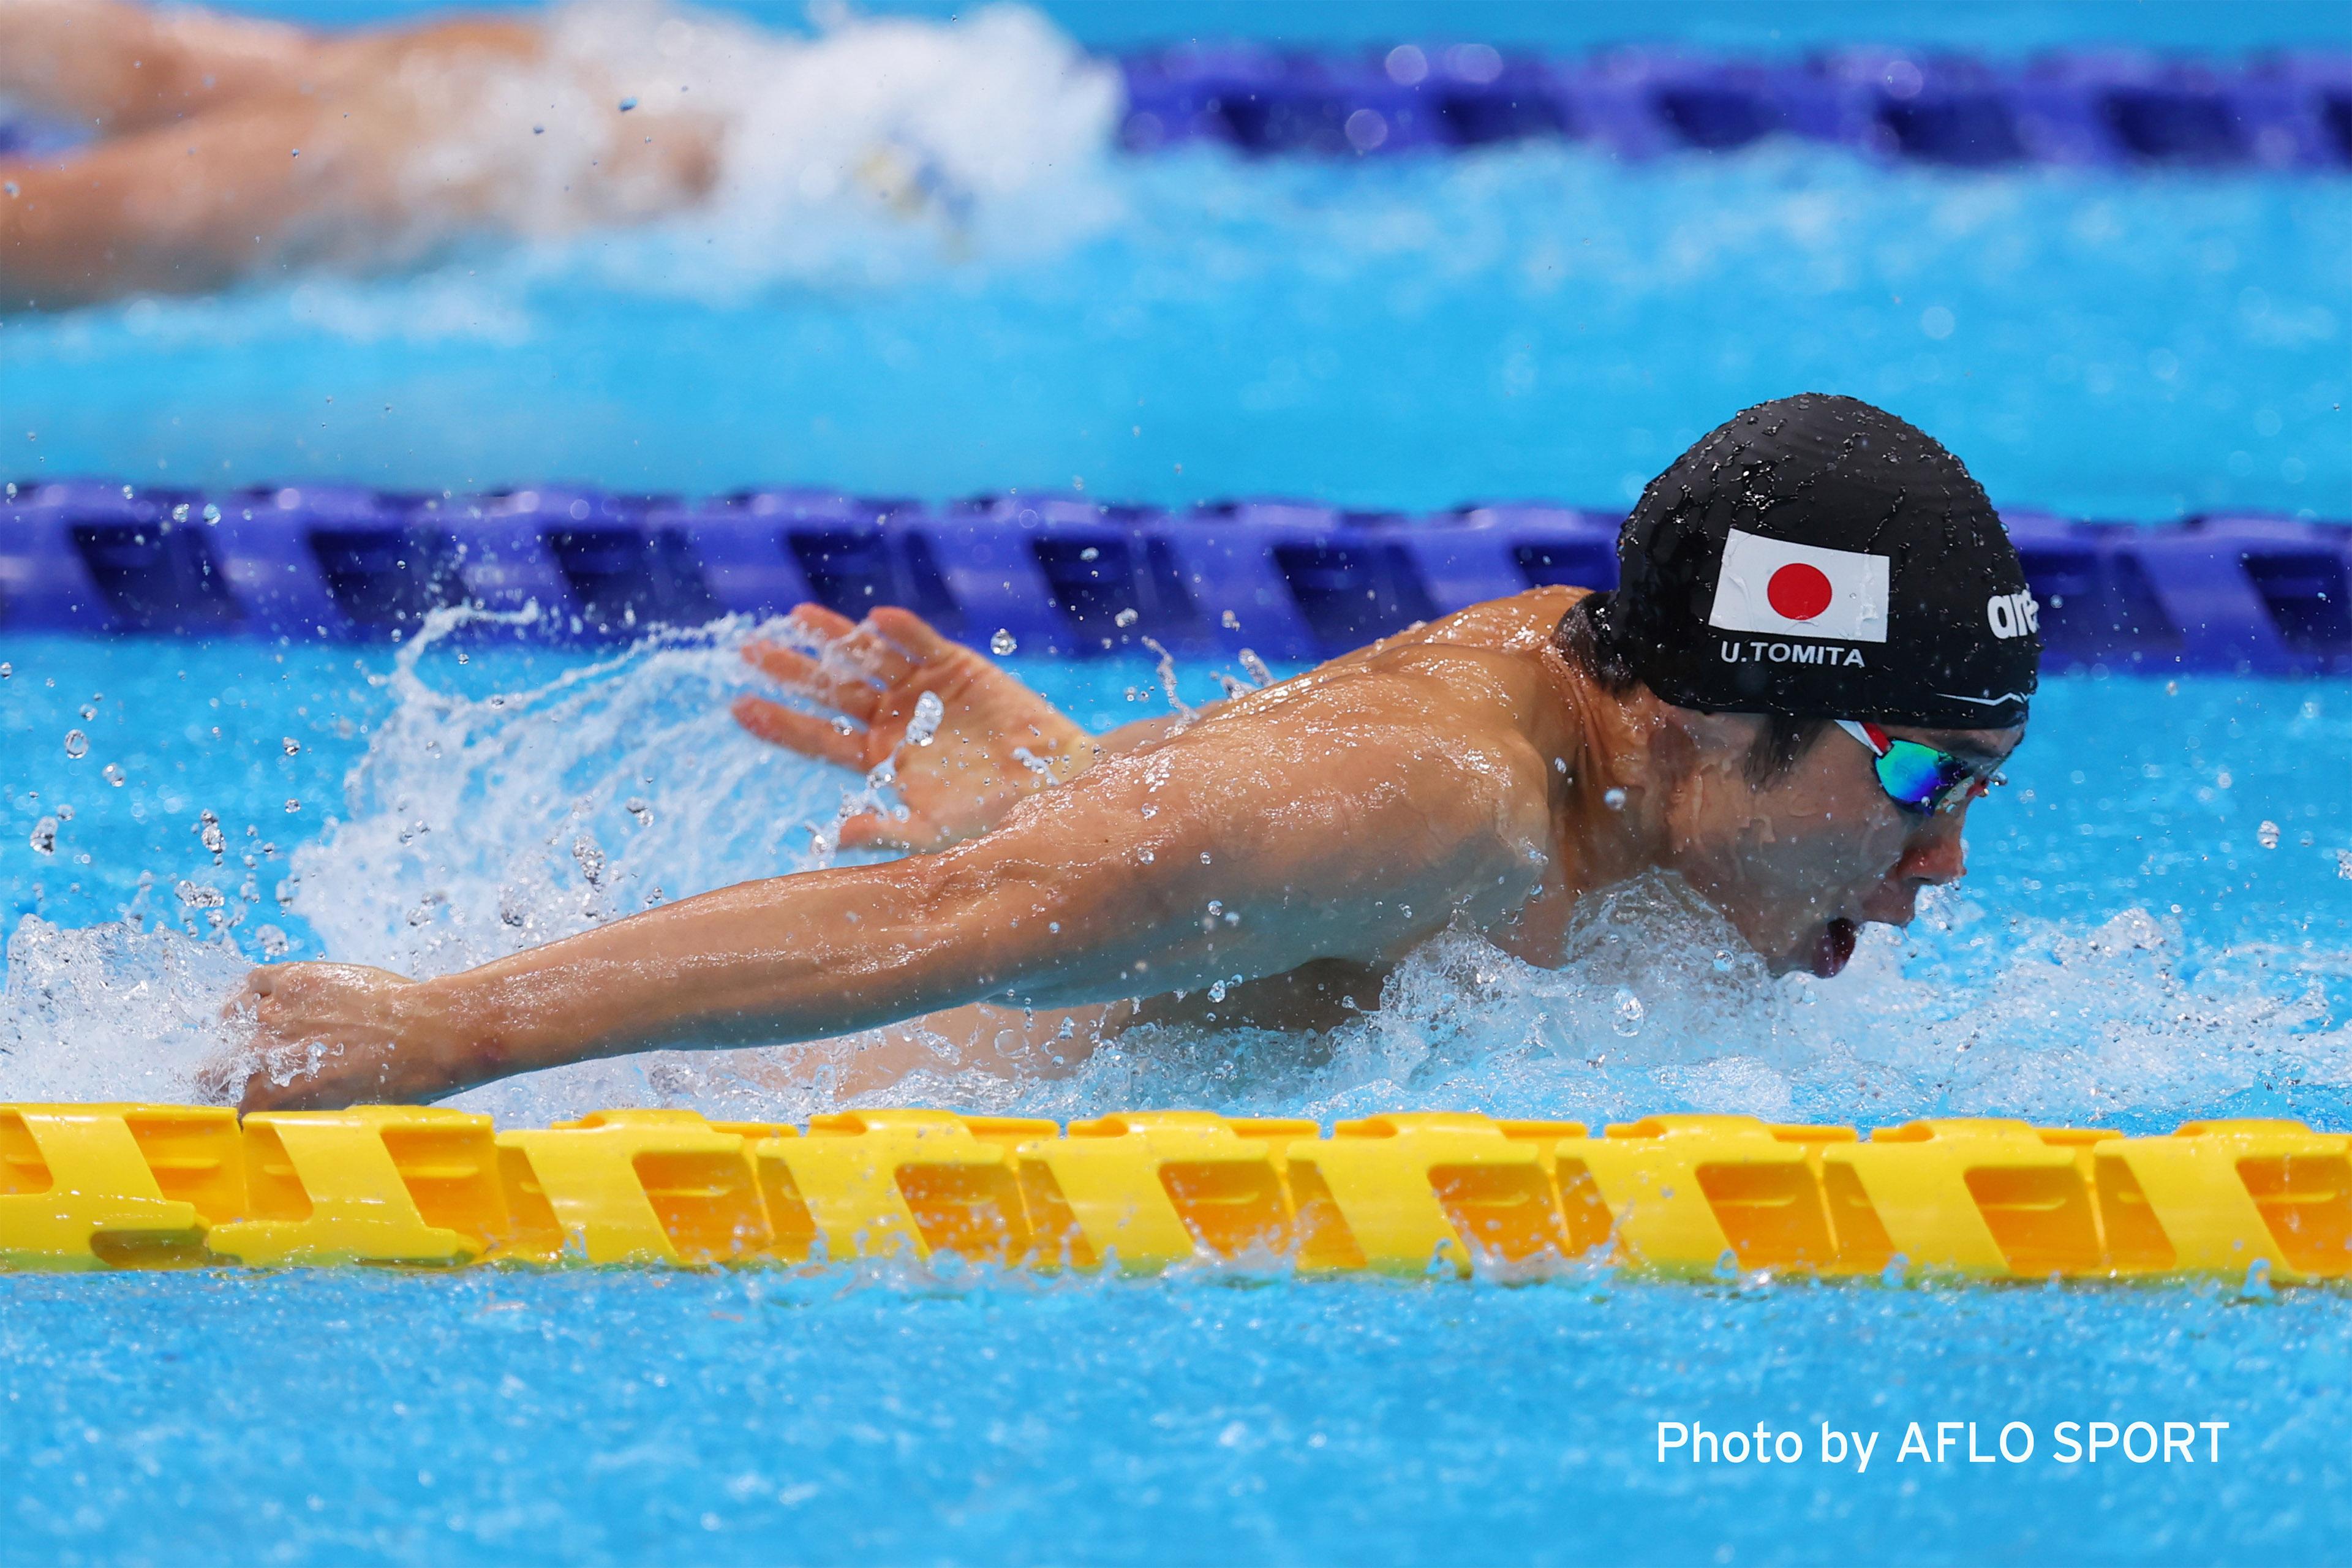 EY Japan所属 富田宇宙選手の東京2020パラリンピック銅メダル獲得のお知らせ